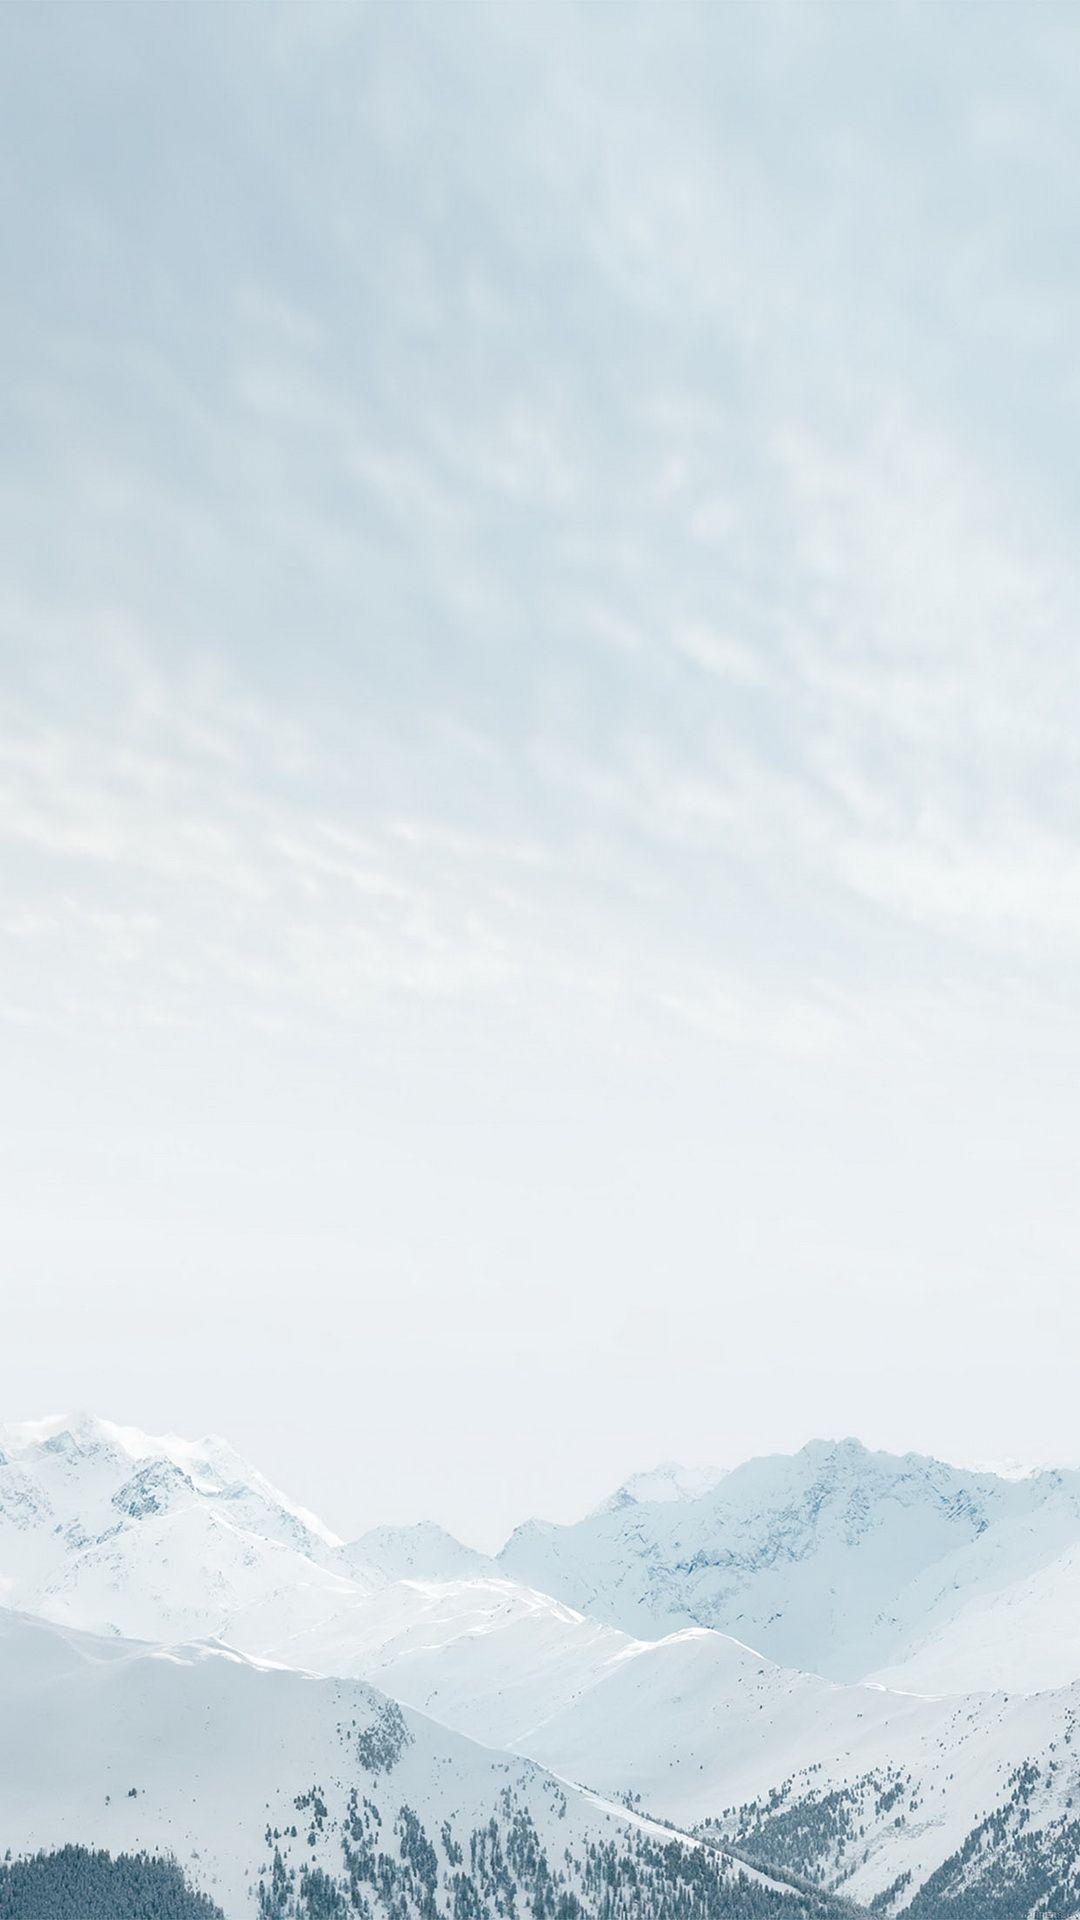 Download Wallpaper Home Screen Snow - fa3c5e0de559eea2a1dbe03c6a30263f  Photograph_452392.jpg